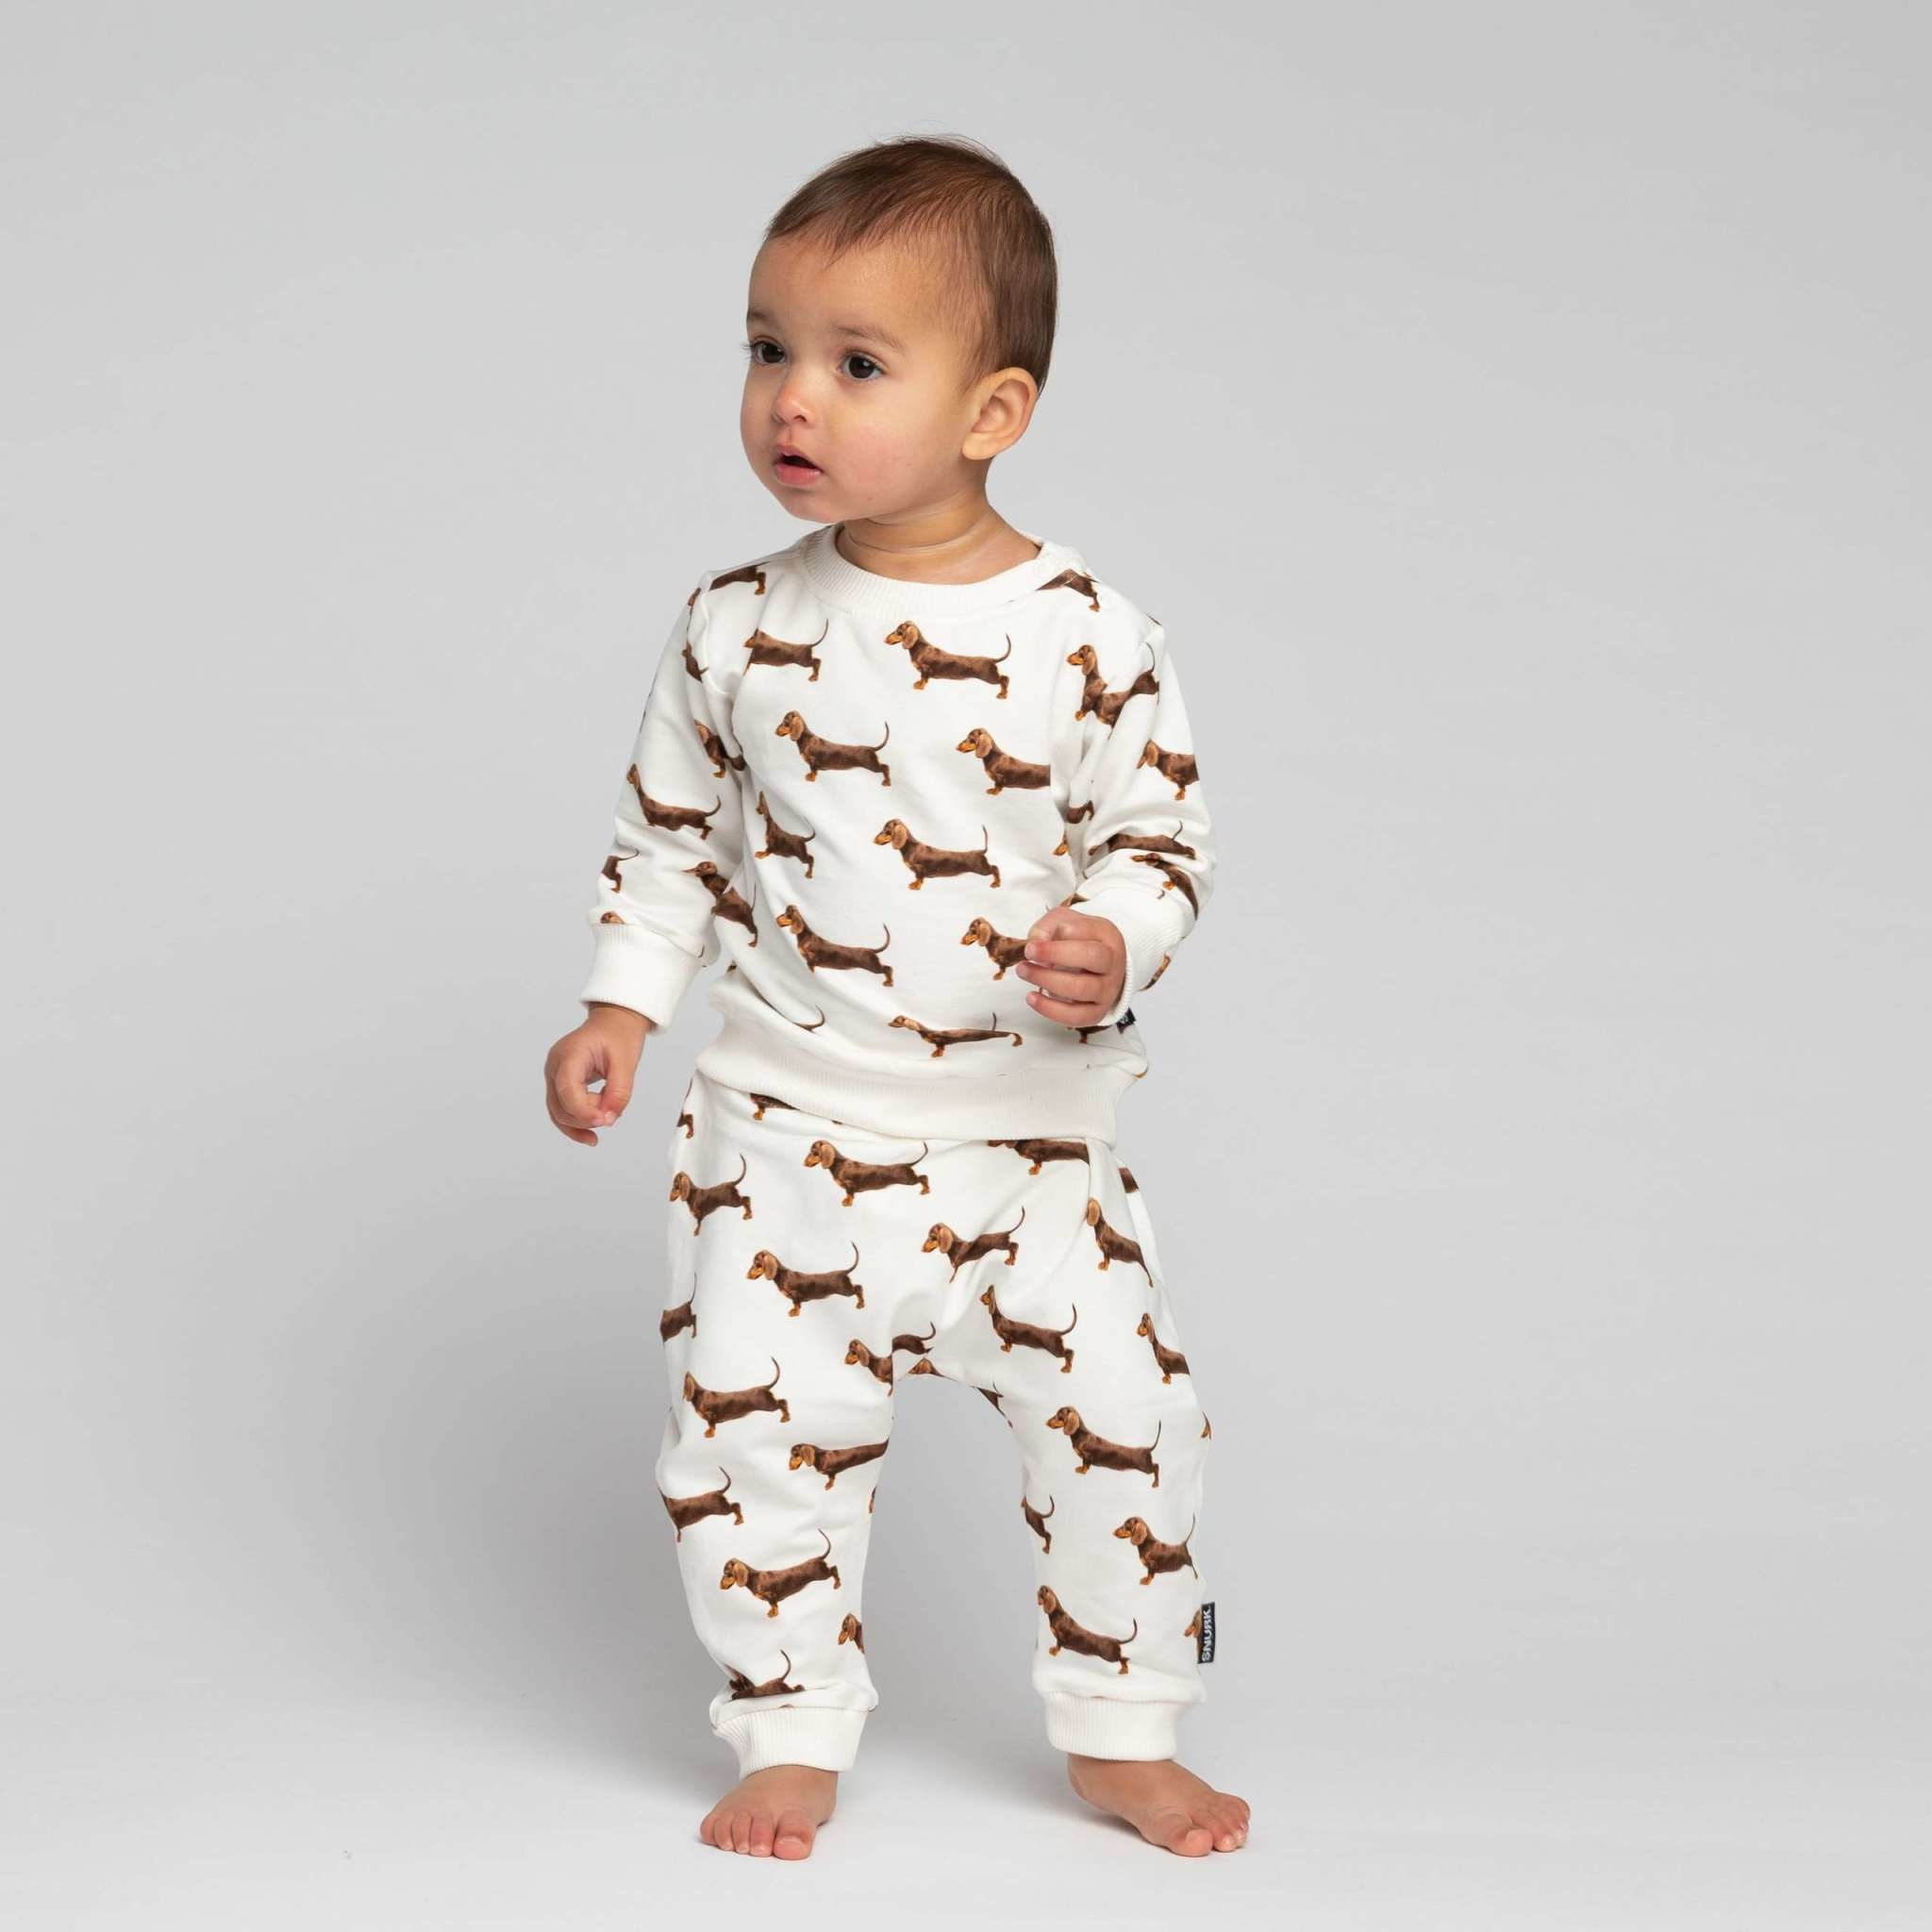 Snurk Snurk - James pants babies